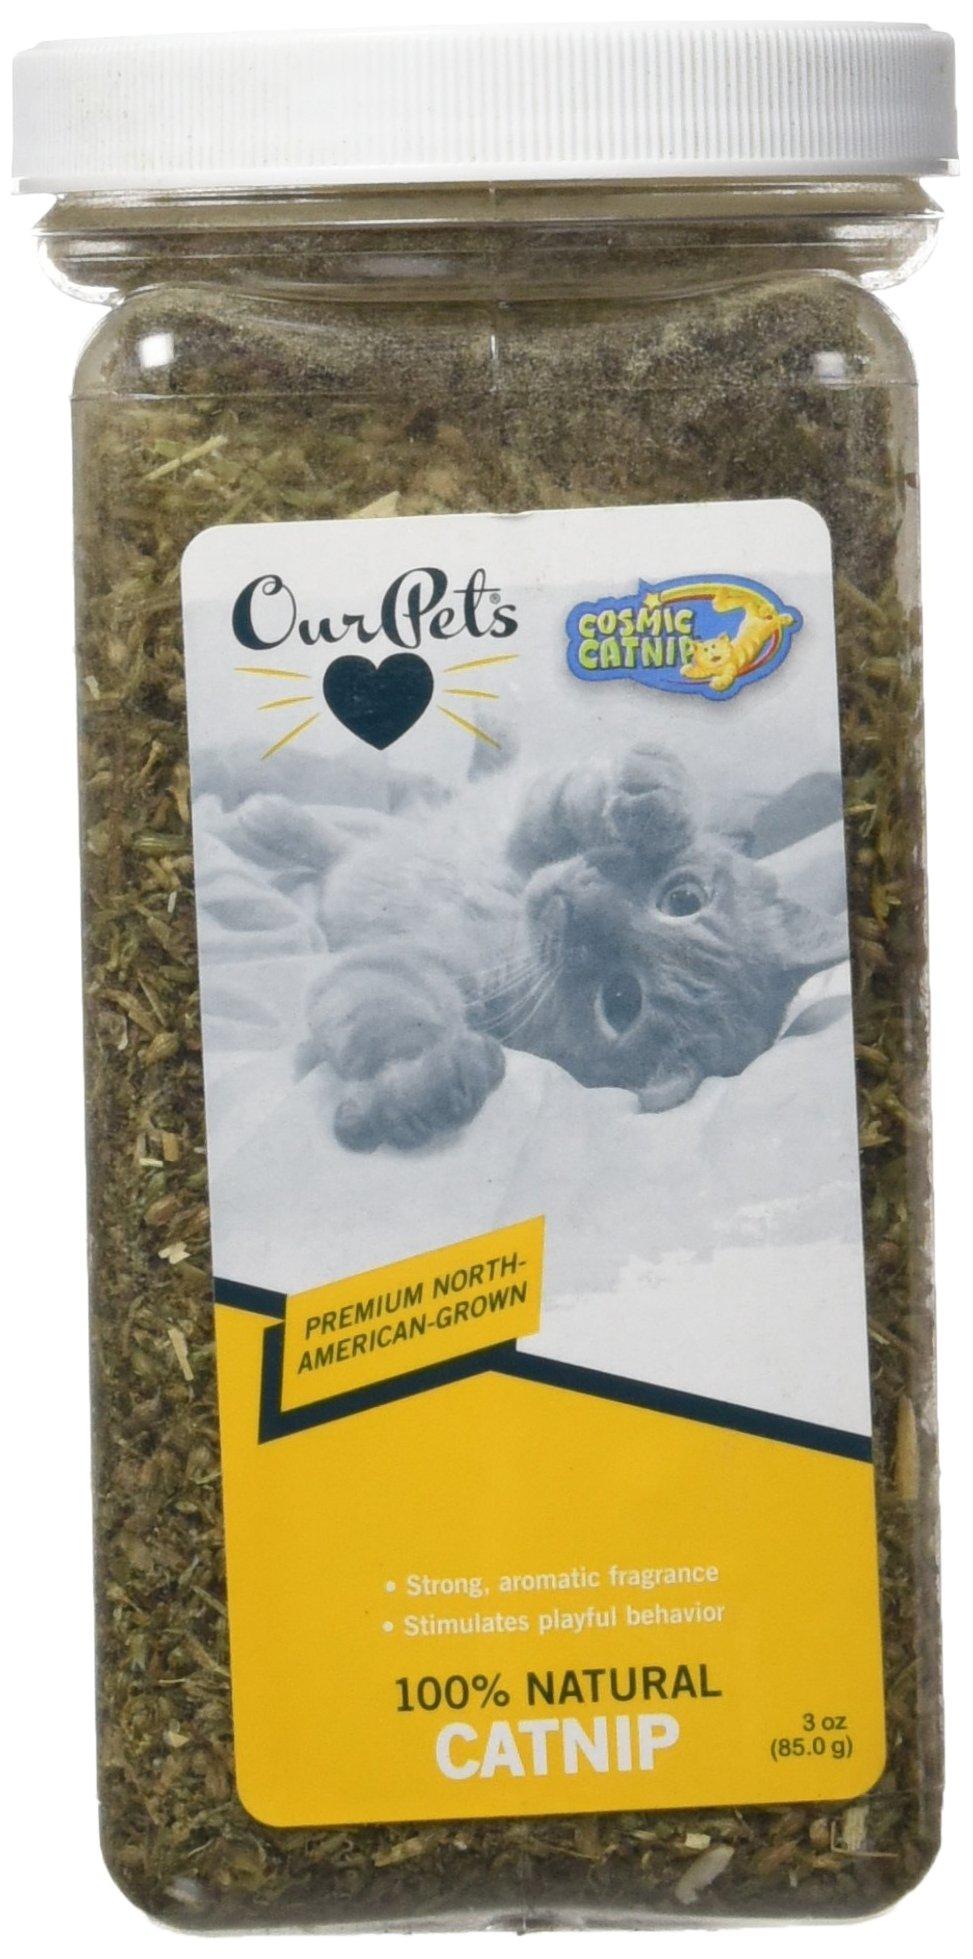 OurPets Premium North-American Grown Catnip Jar, 3-Ounce